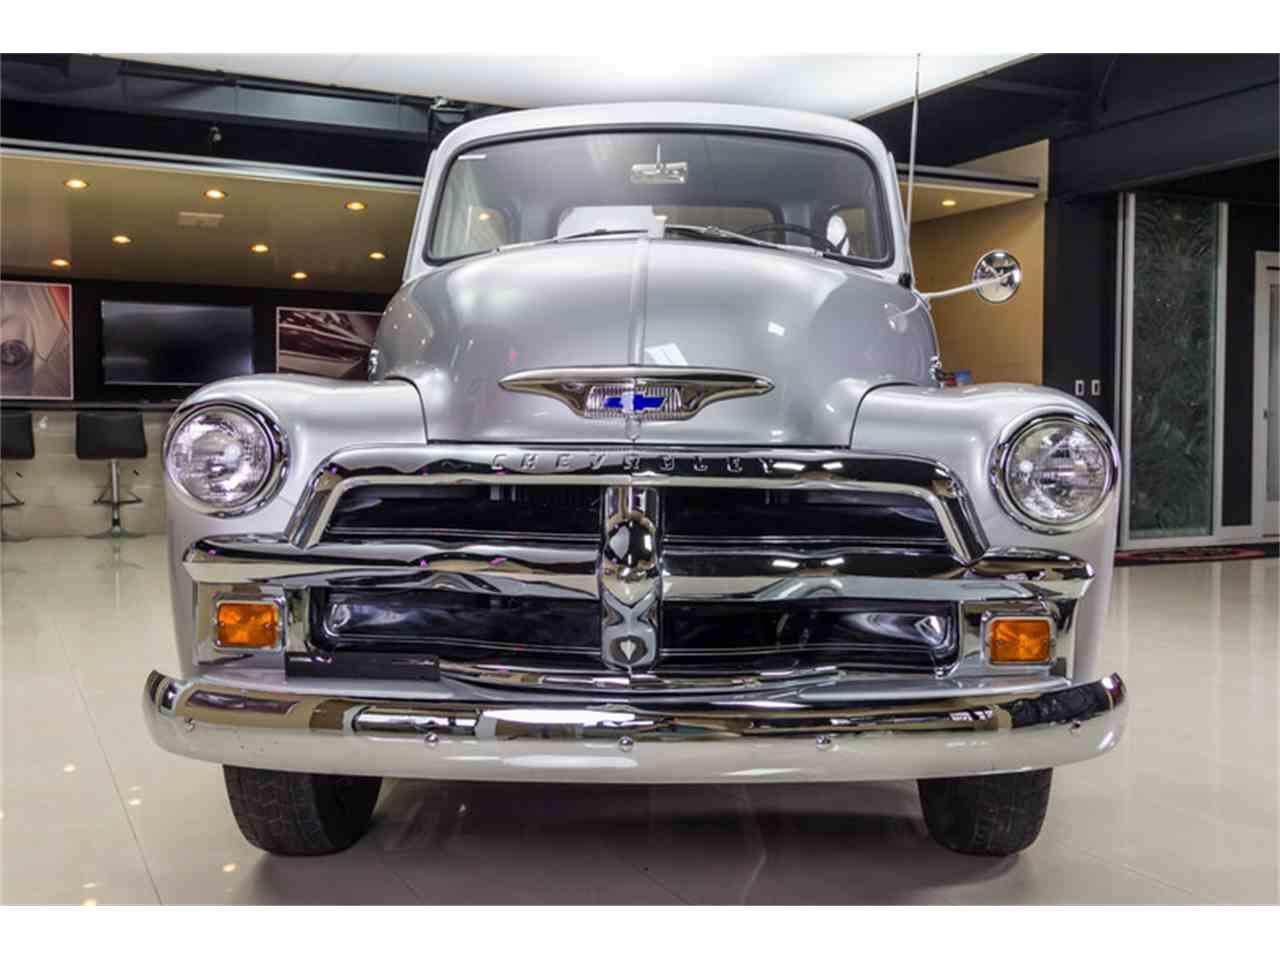 Large Picture of '55 Chevrolet 3100 5 Window Deluxe Pickup located in Michigan - $43,900.00 - JUIZ